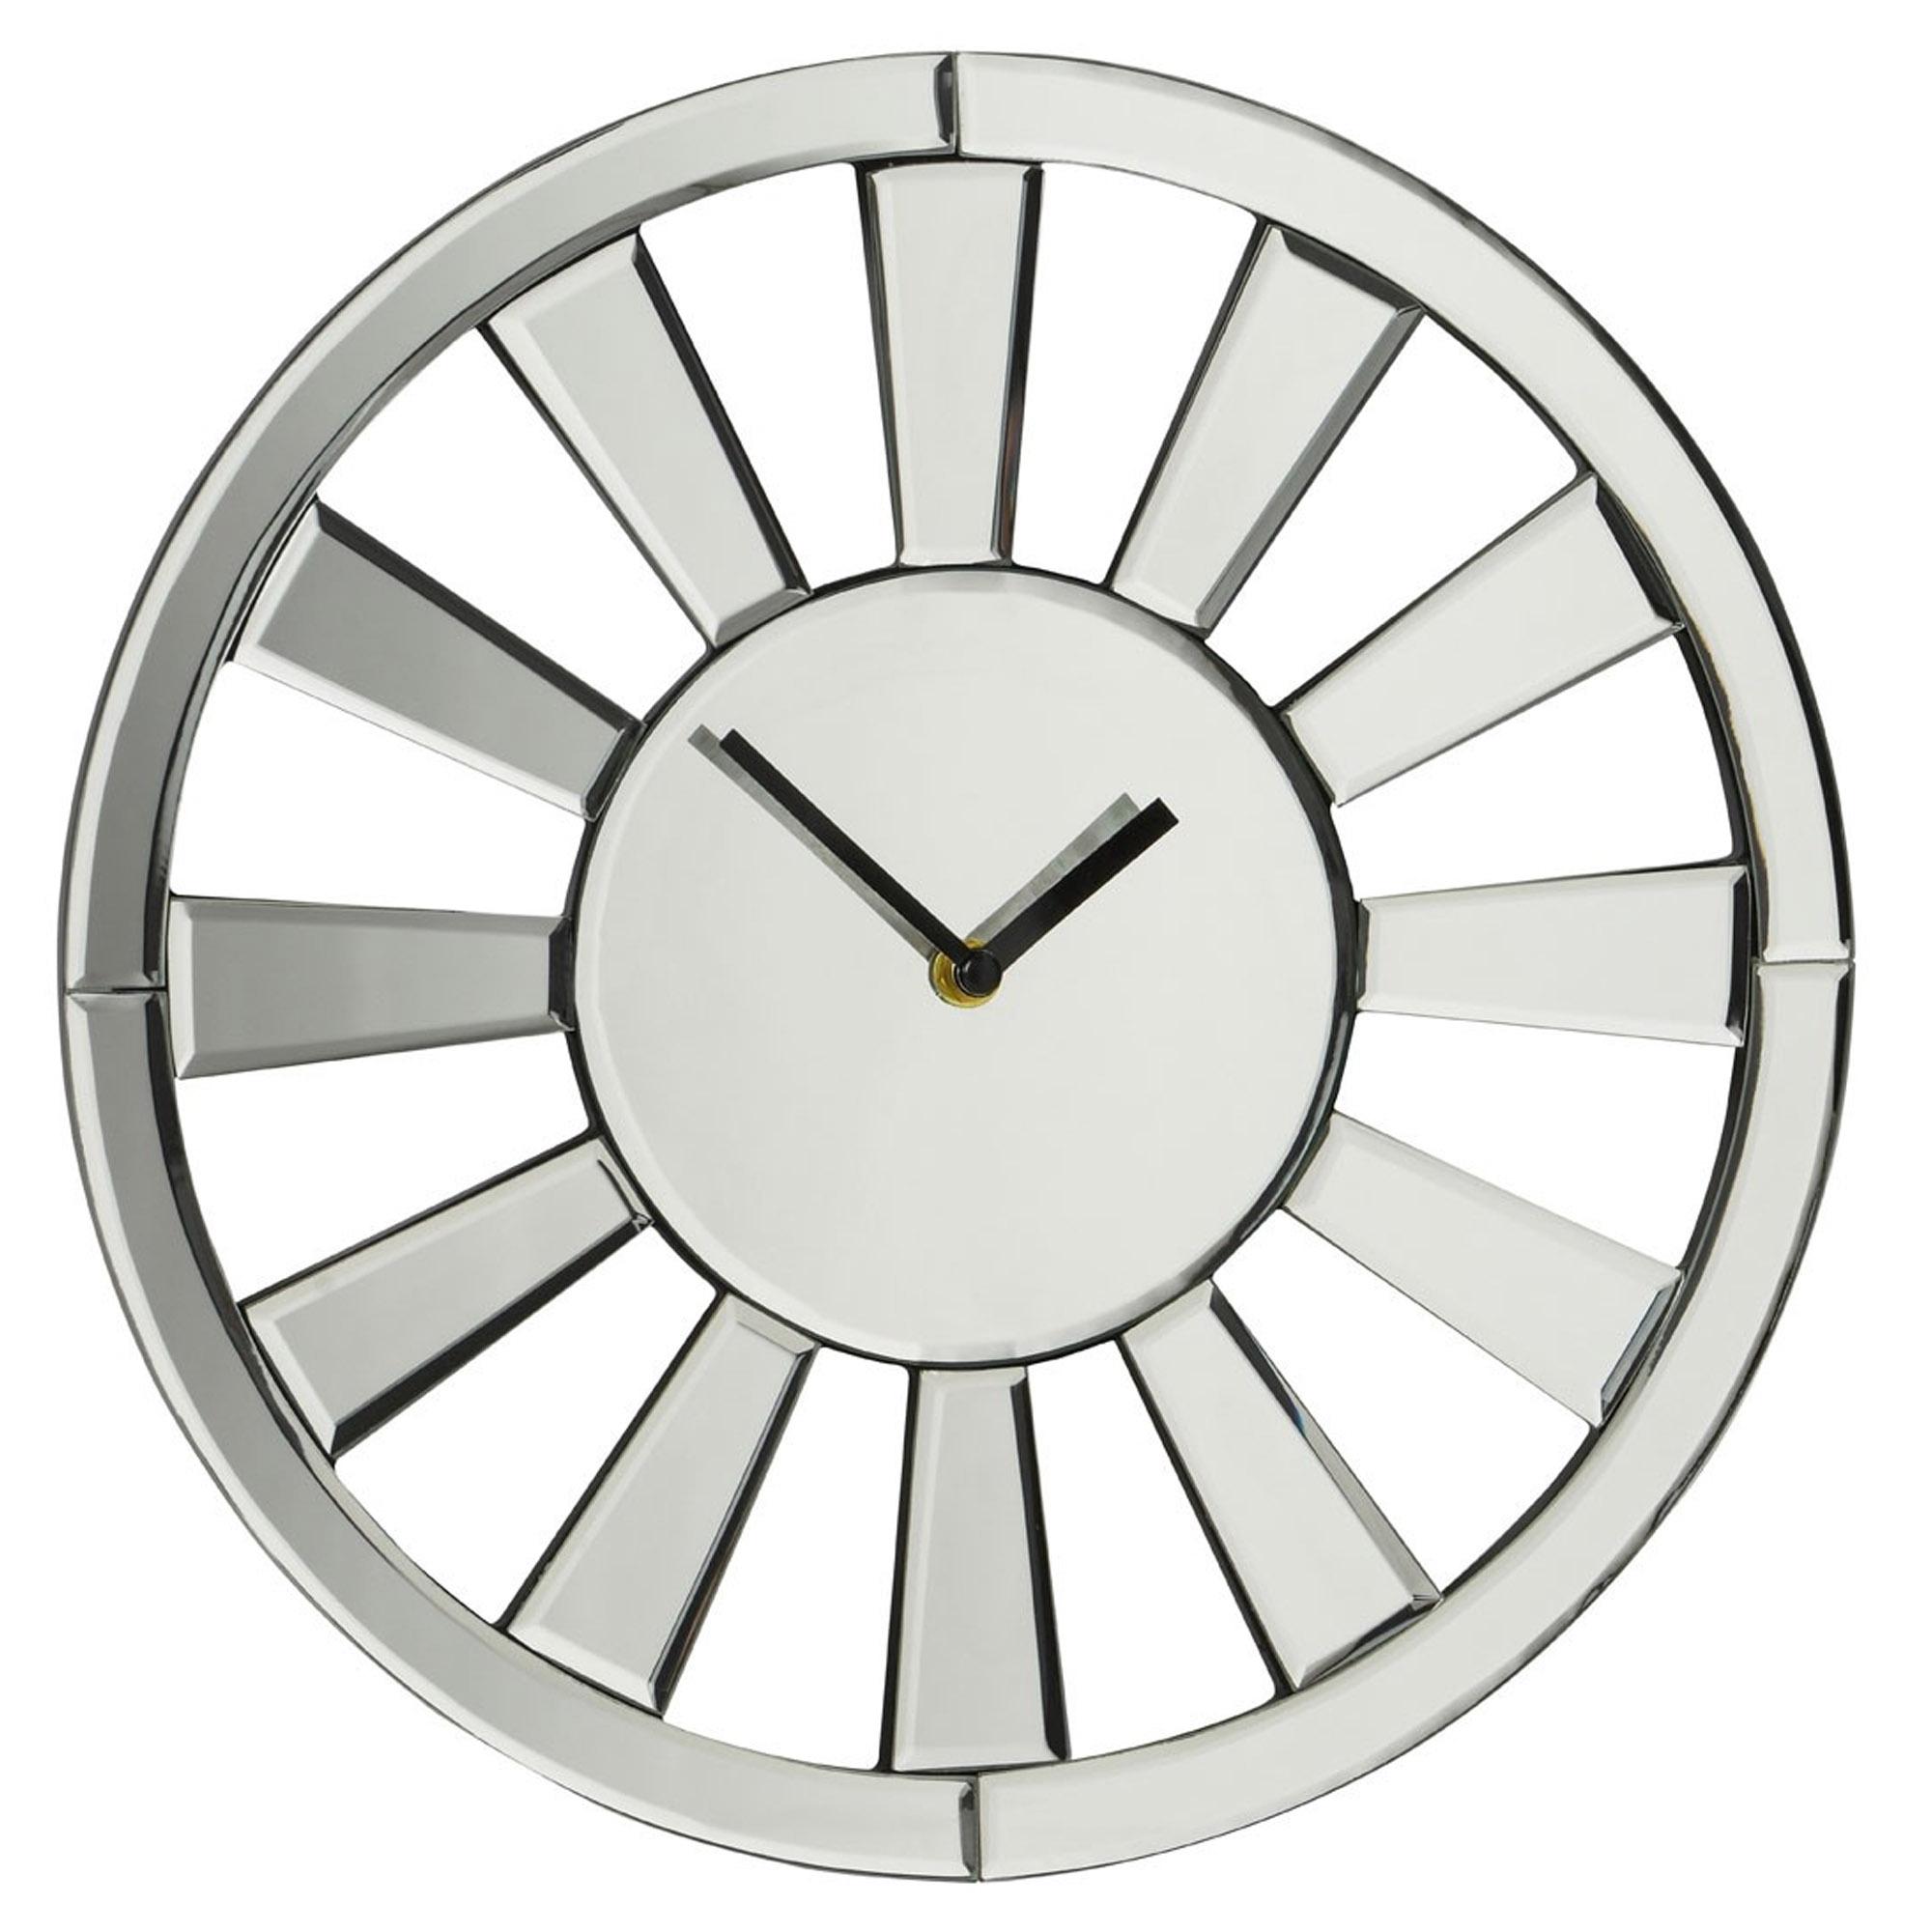 Mirrored Wall Clock | Modern & Contemporary Furniture